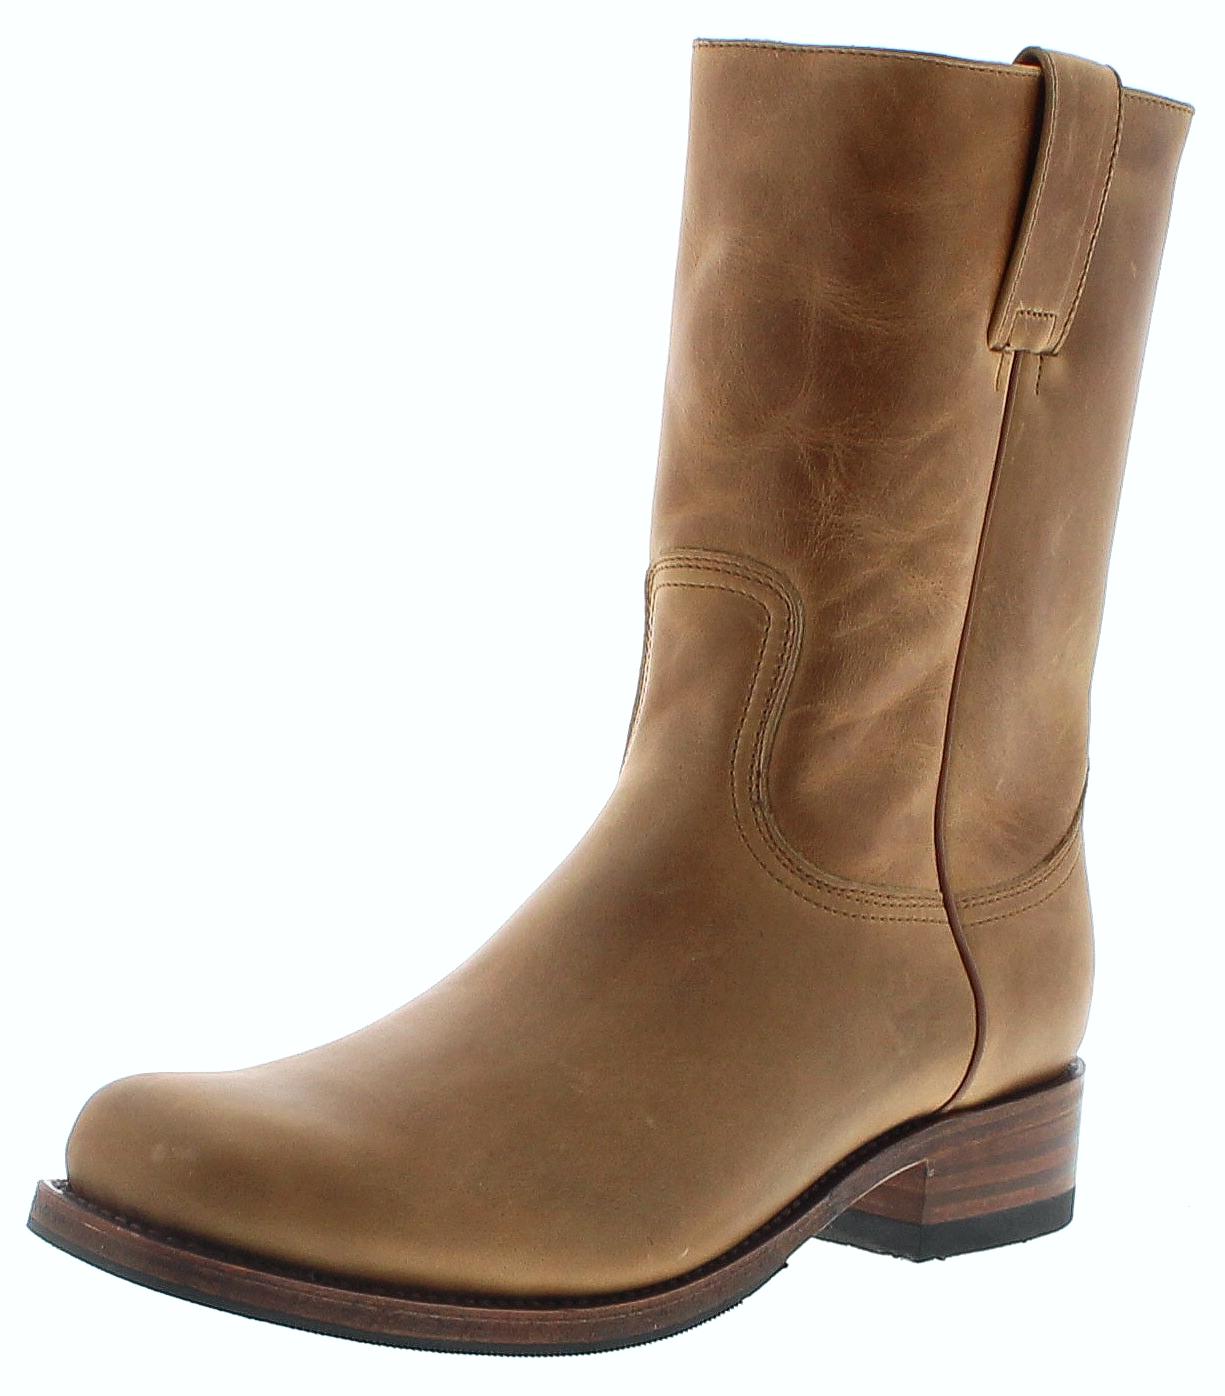 Sendra Boots 4503 Teak Lederstiefel mit Merinofell Futter - braun